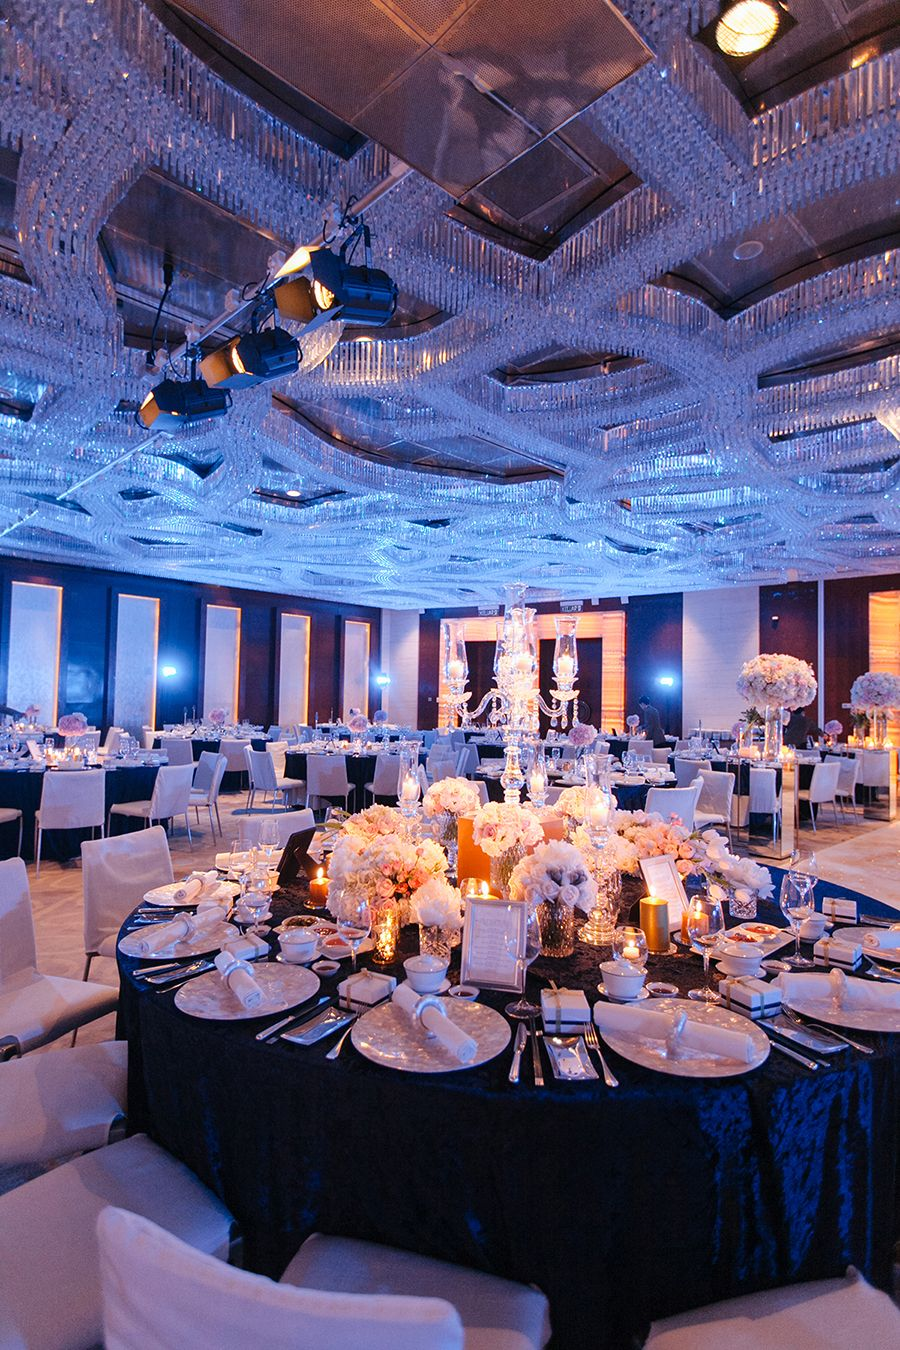 Justin And Melissa S Elegant Wedding At Grand Hyatt Grand Hyatt Hyatt Wedding Wedding